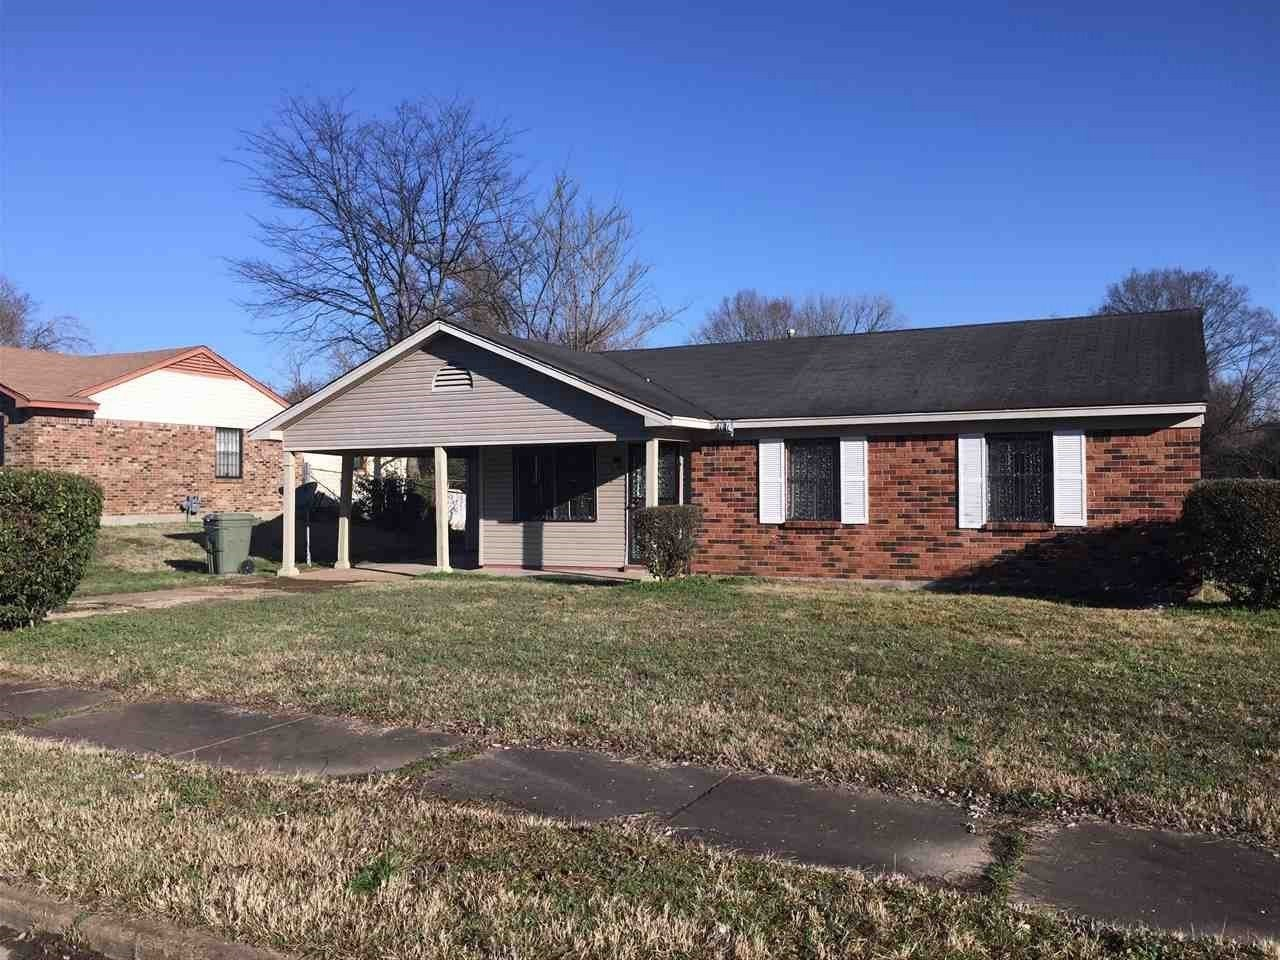 472 Tikamthi Memphis, TN 38109